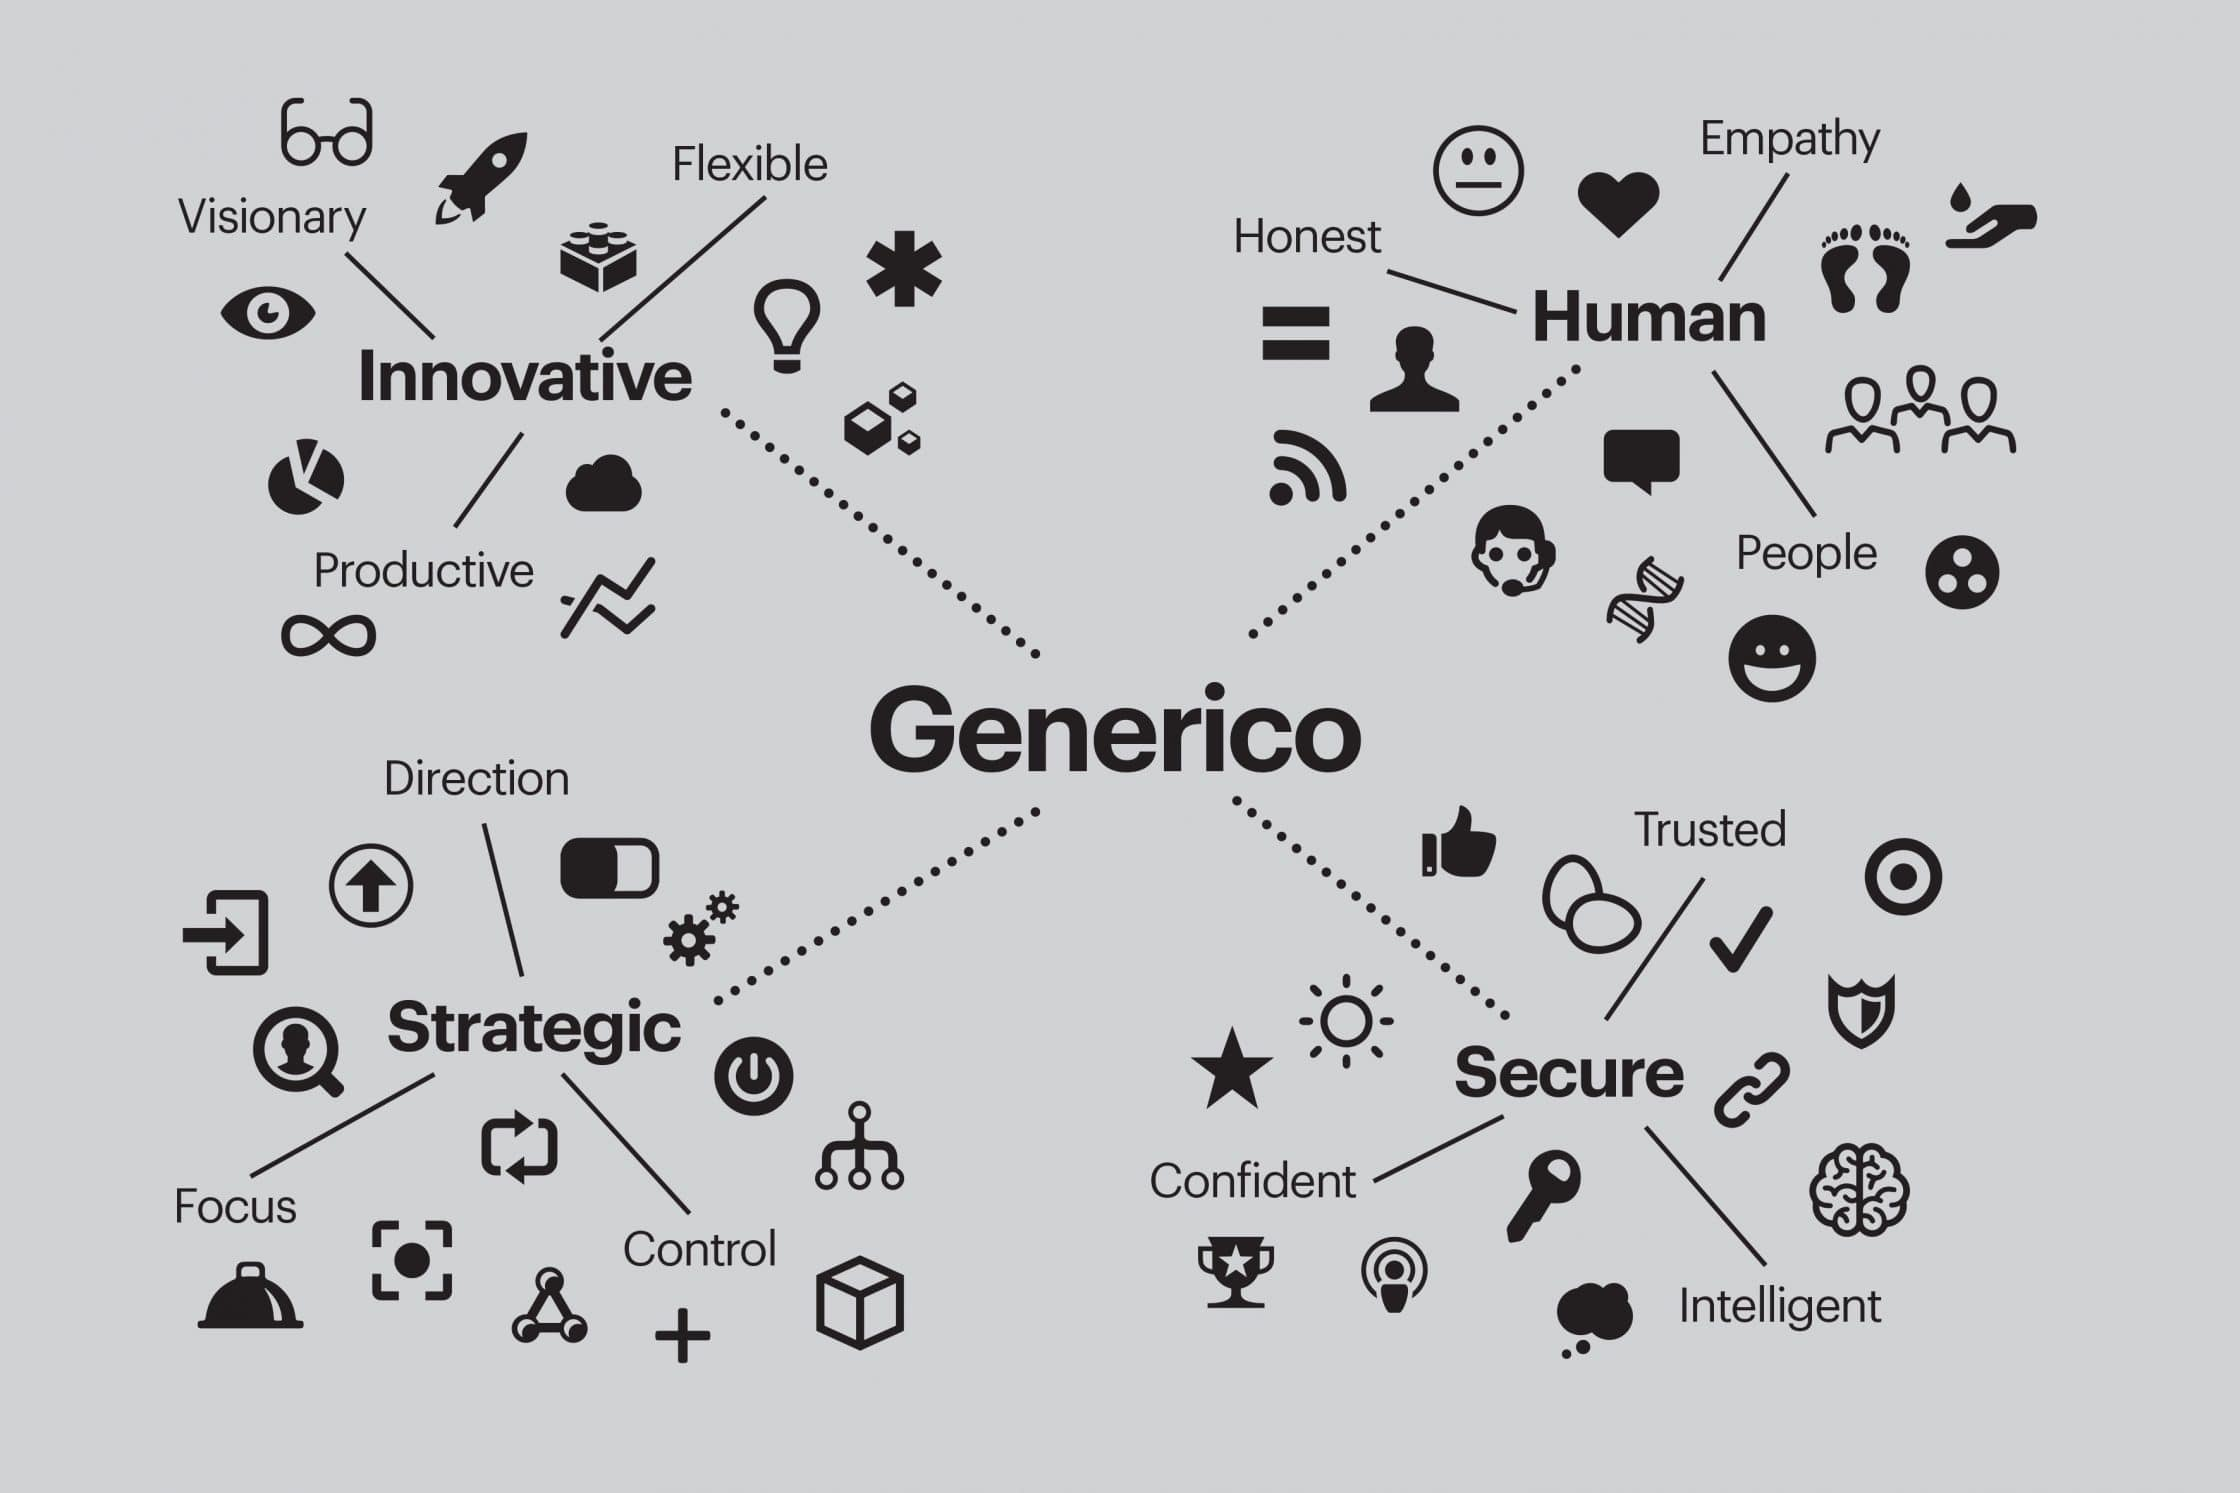 How To Design A Logo: 12 Key Steps From A Logo Design Agency